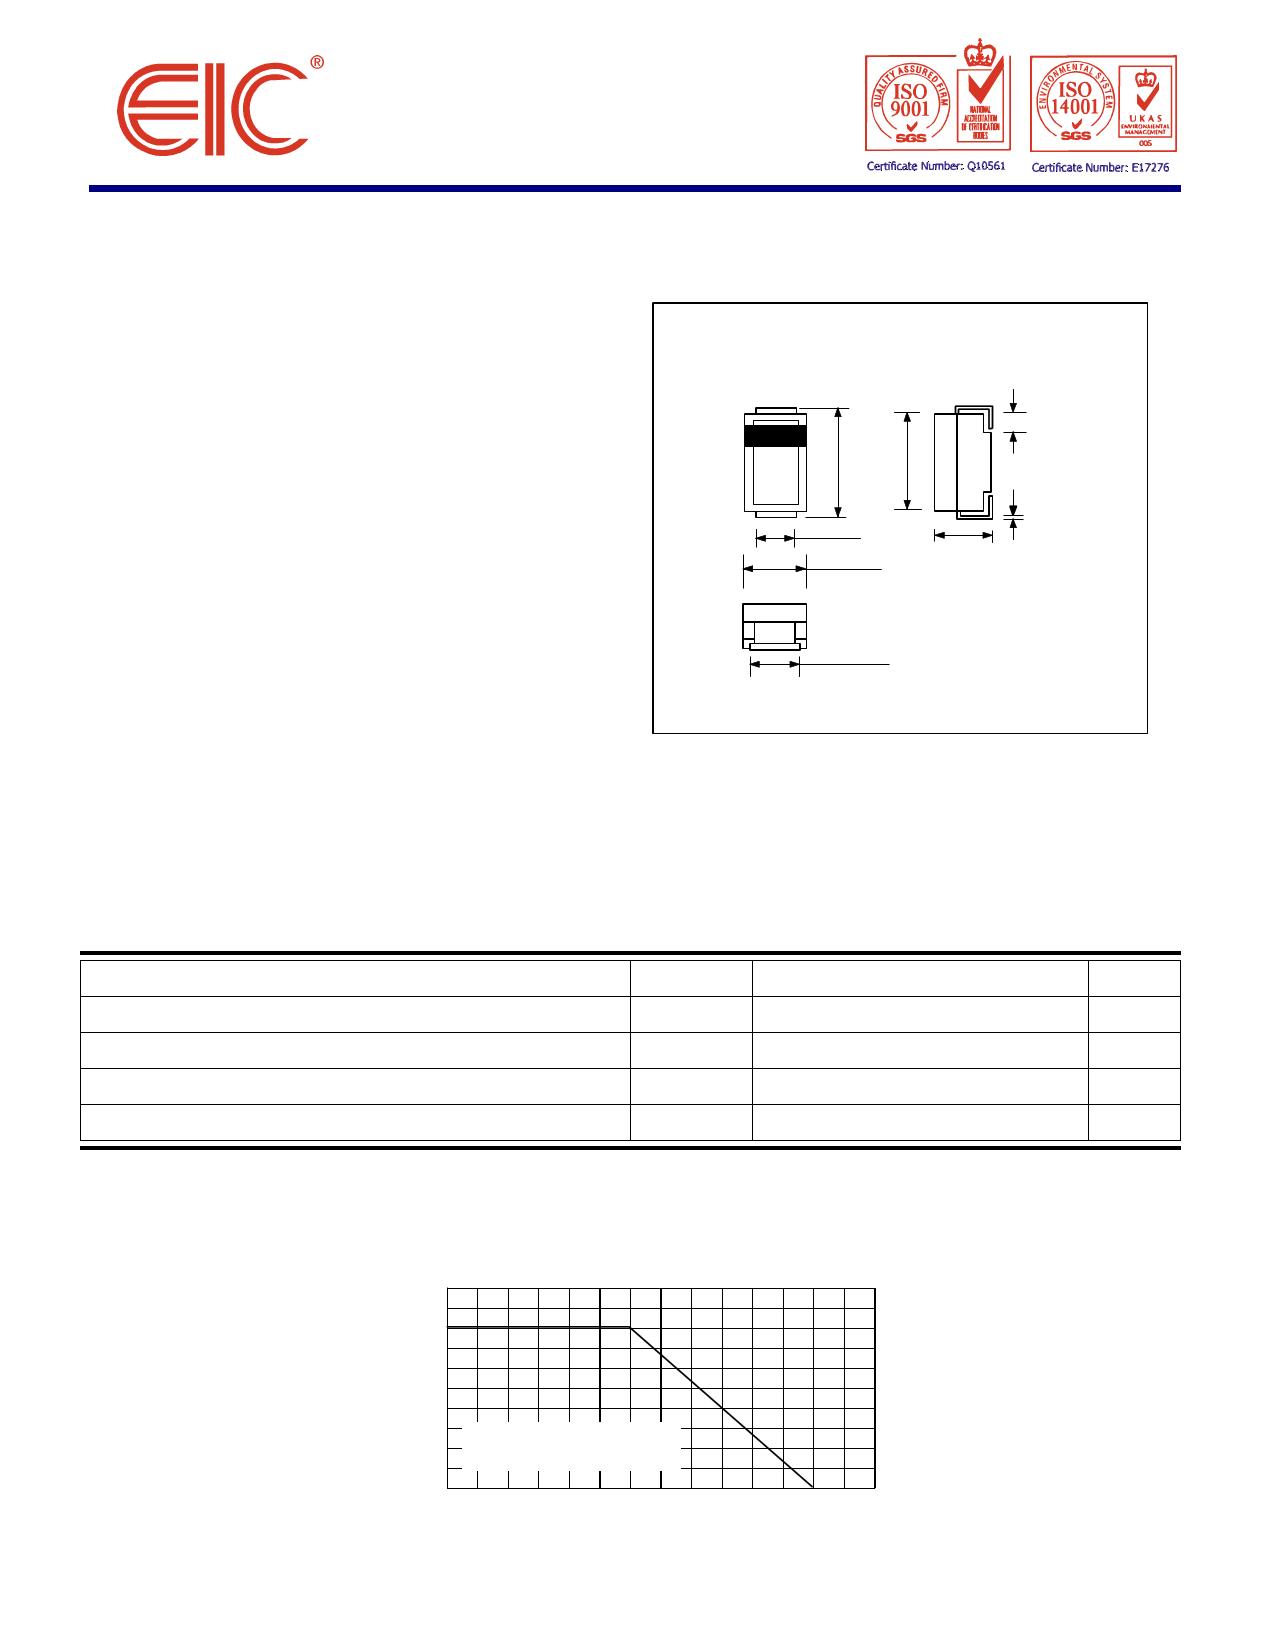 SZ40B9 datasheet, circuit